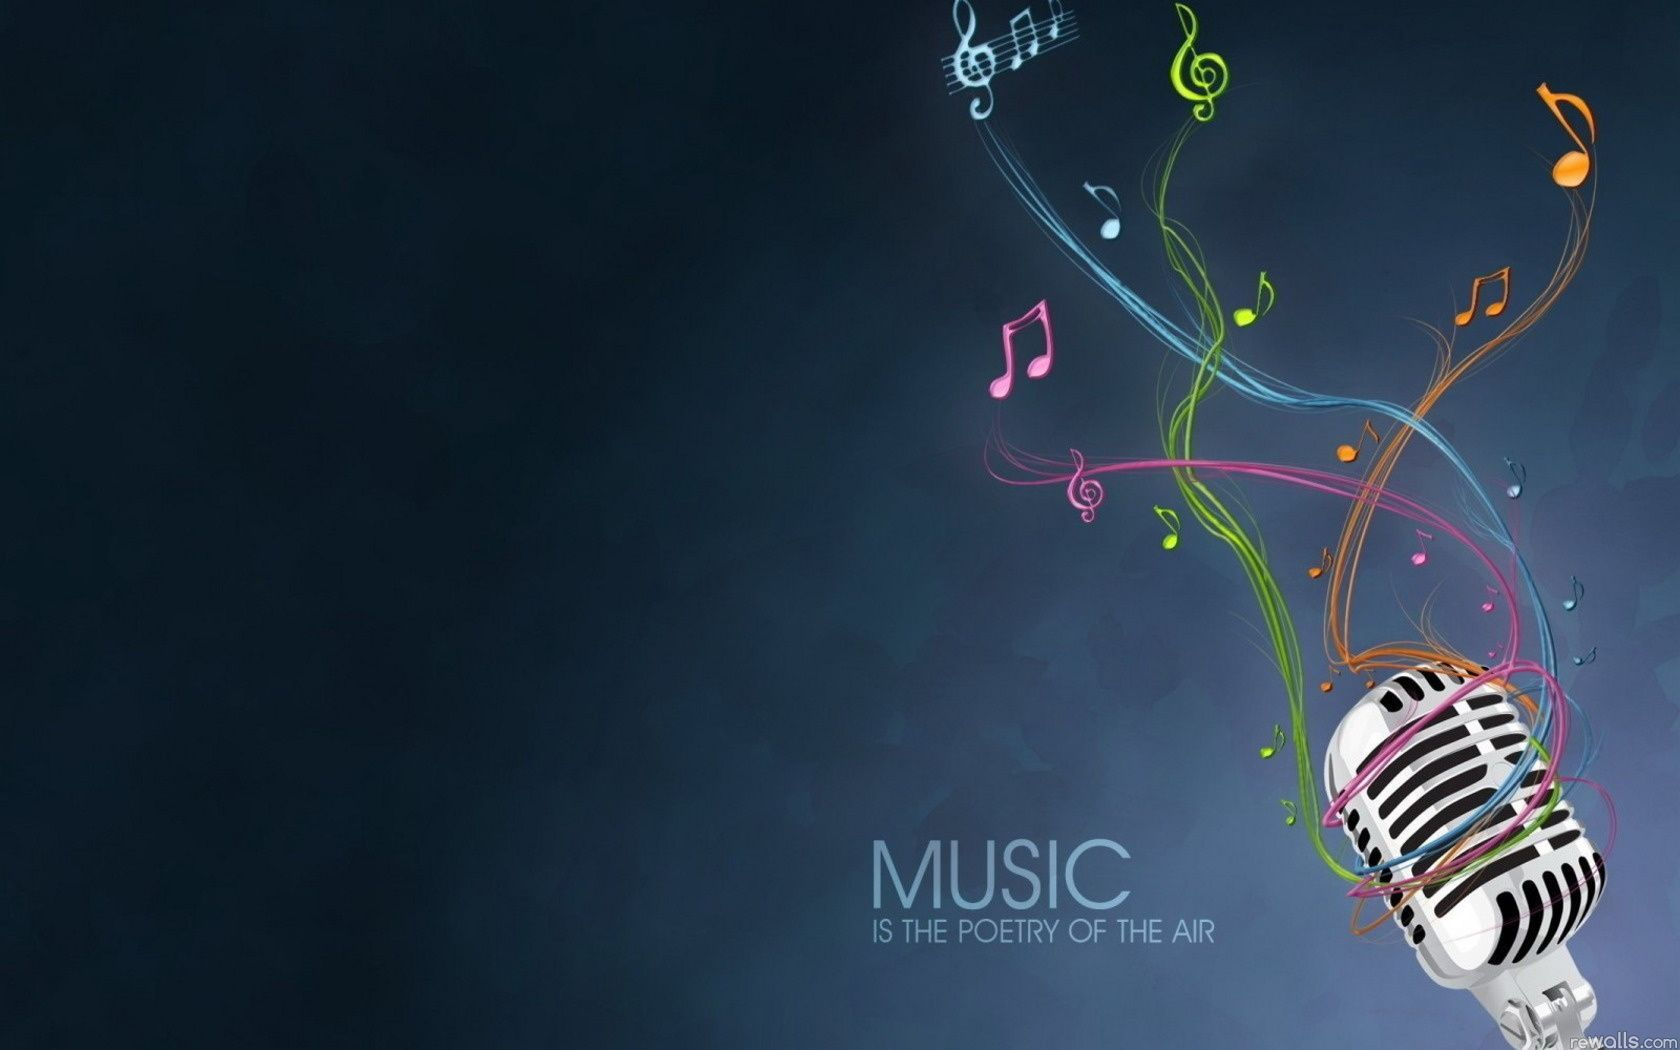 Music Poetry Of Air Hd Desktop Wallpaper